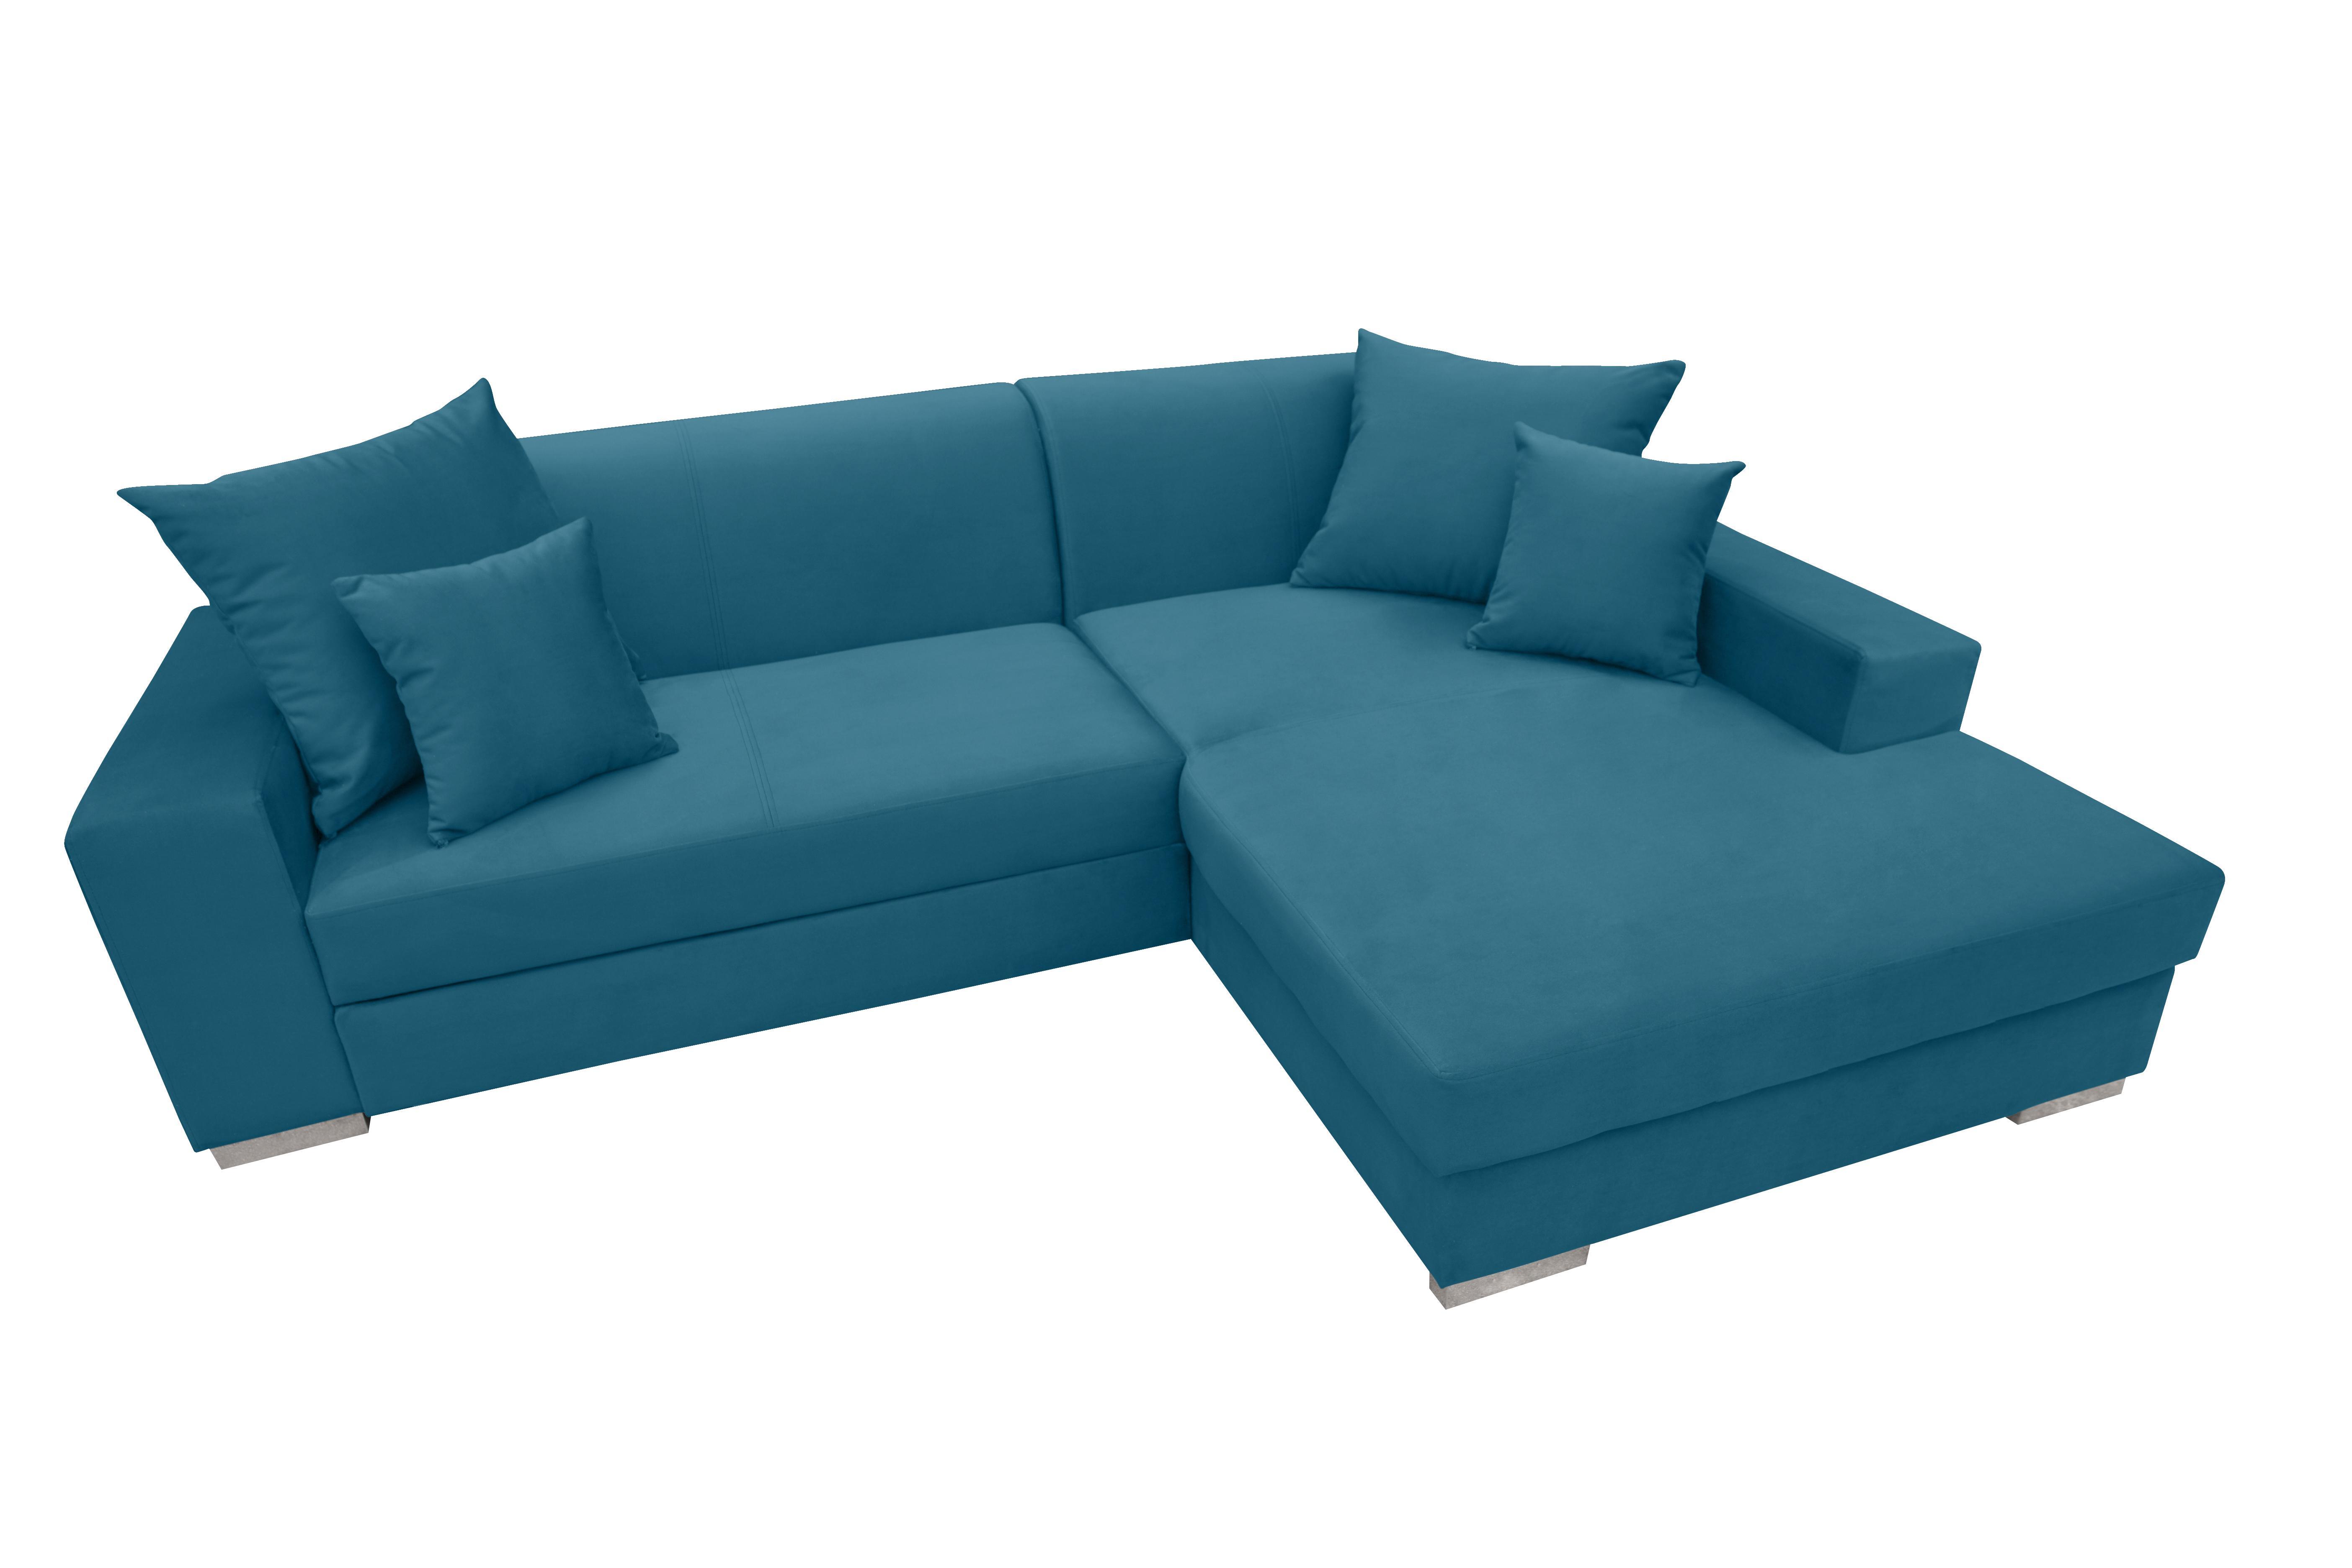 Rohová sedačka Montura (tyrkysová) (P)